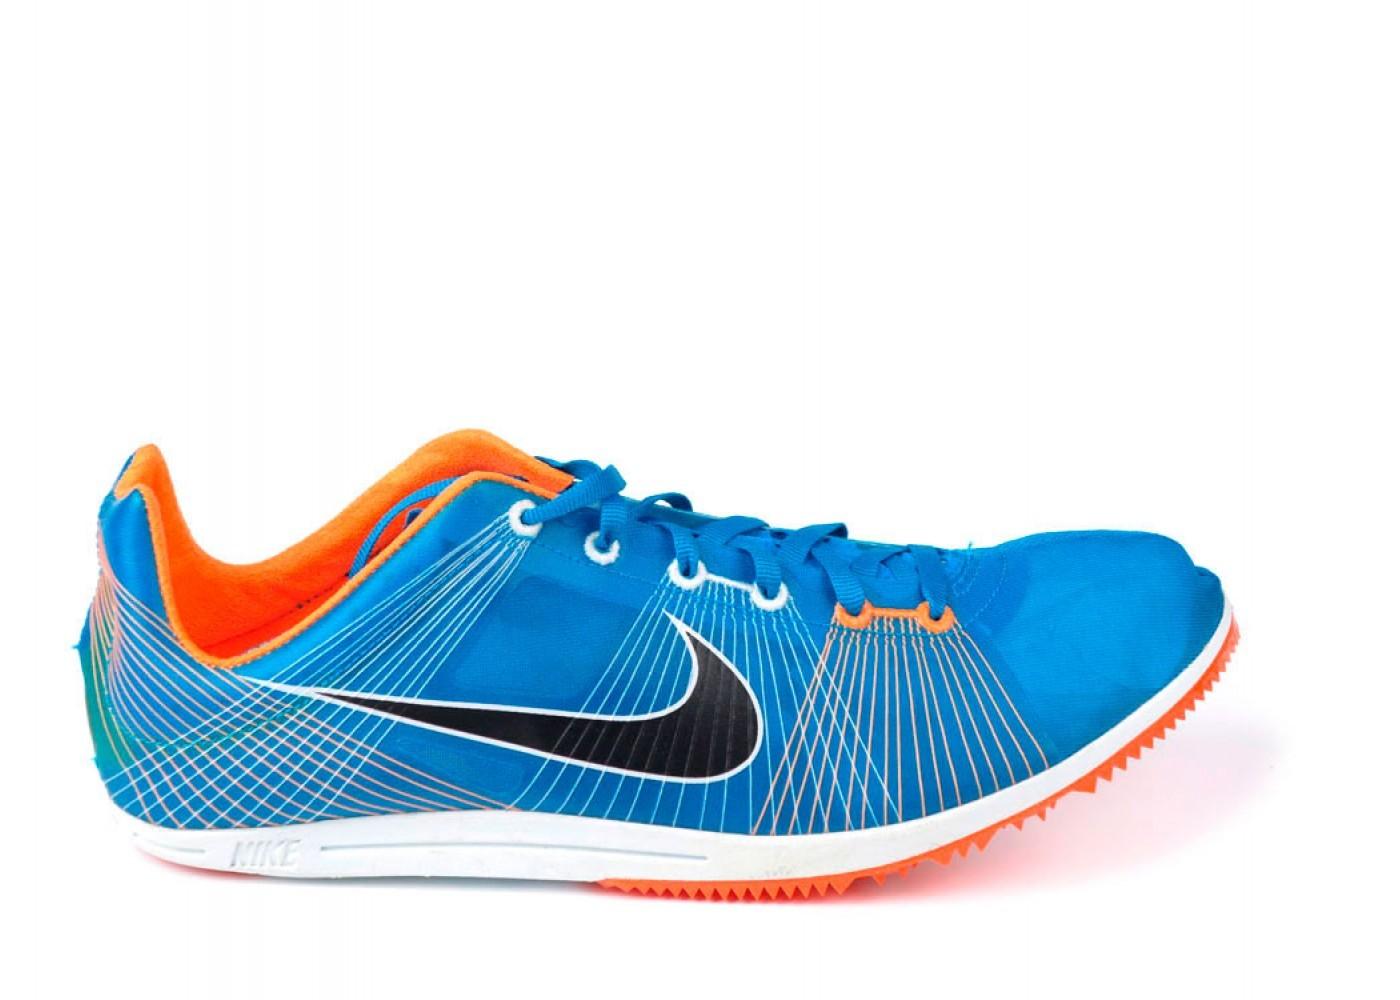 Шиповки Nike Zoom Matumbo на длинные дистанции